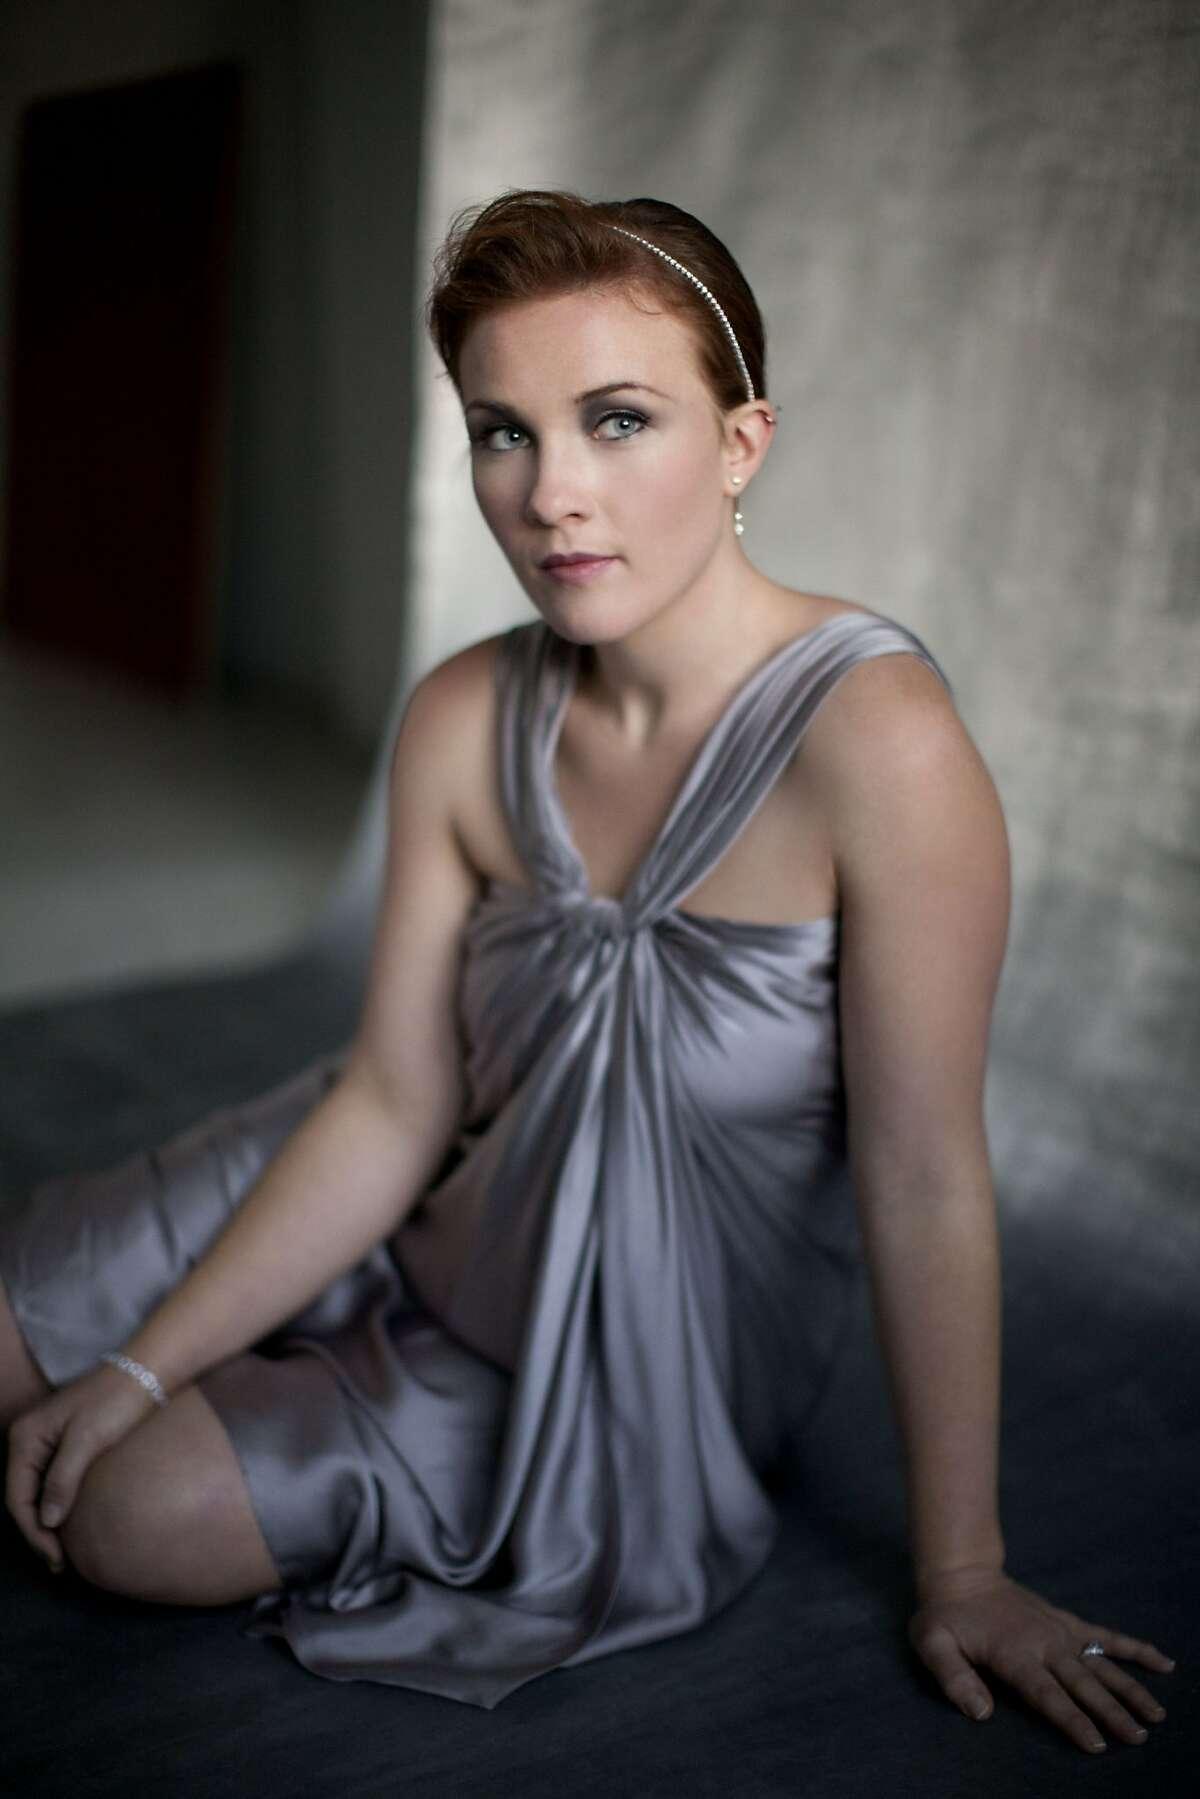 Mezzo-soprano Sasha Cooke